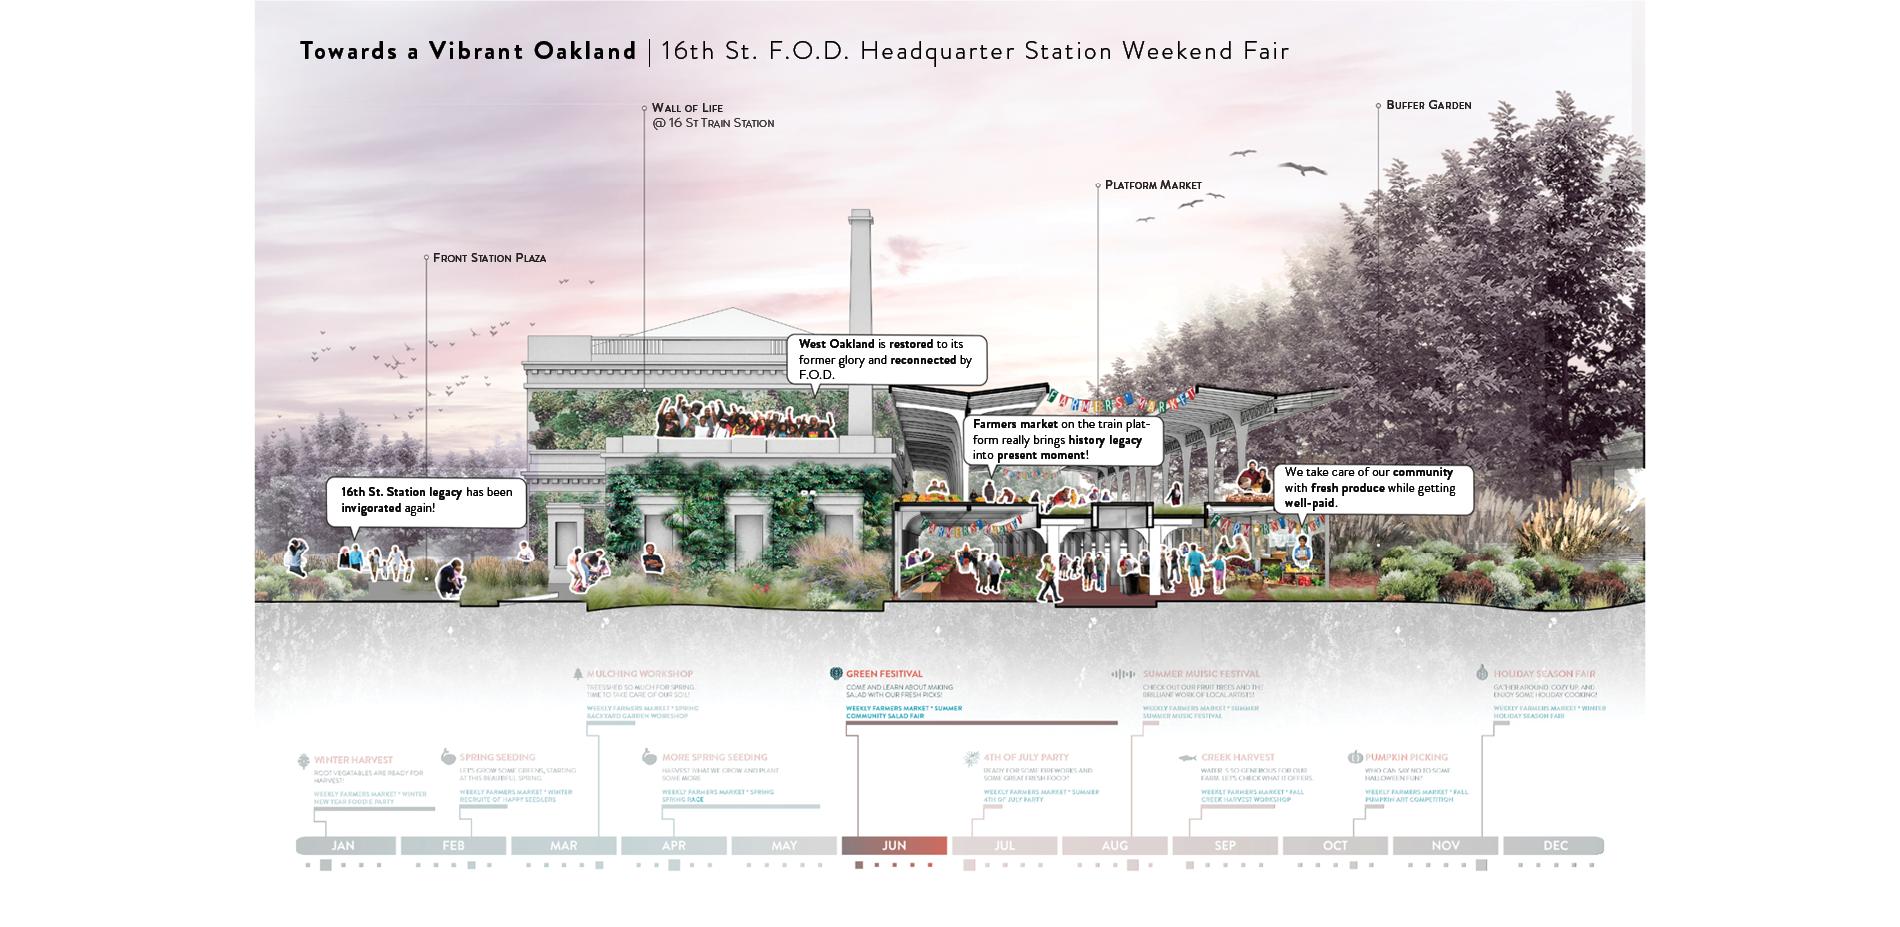 Towards a Vibrant Oakland | 16th St. F.O.D. Headquarter Station Weekend Fair